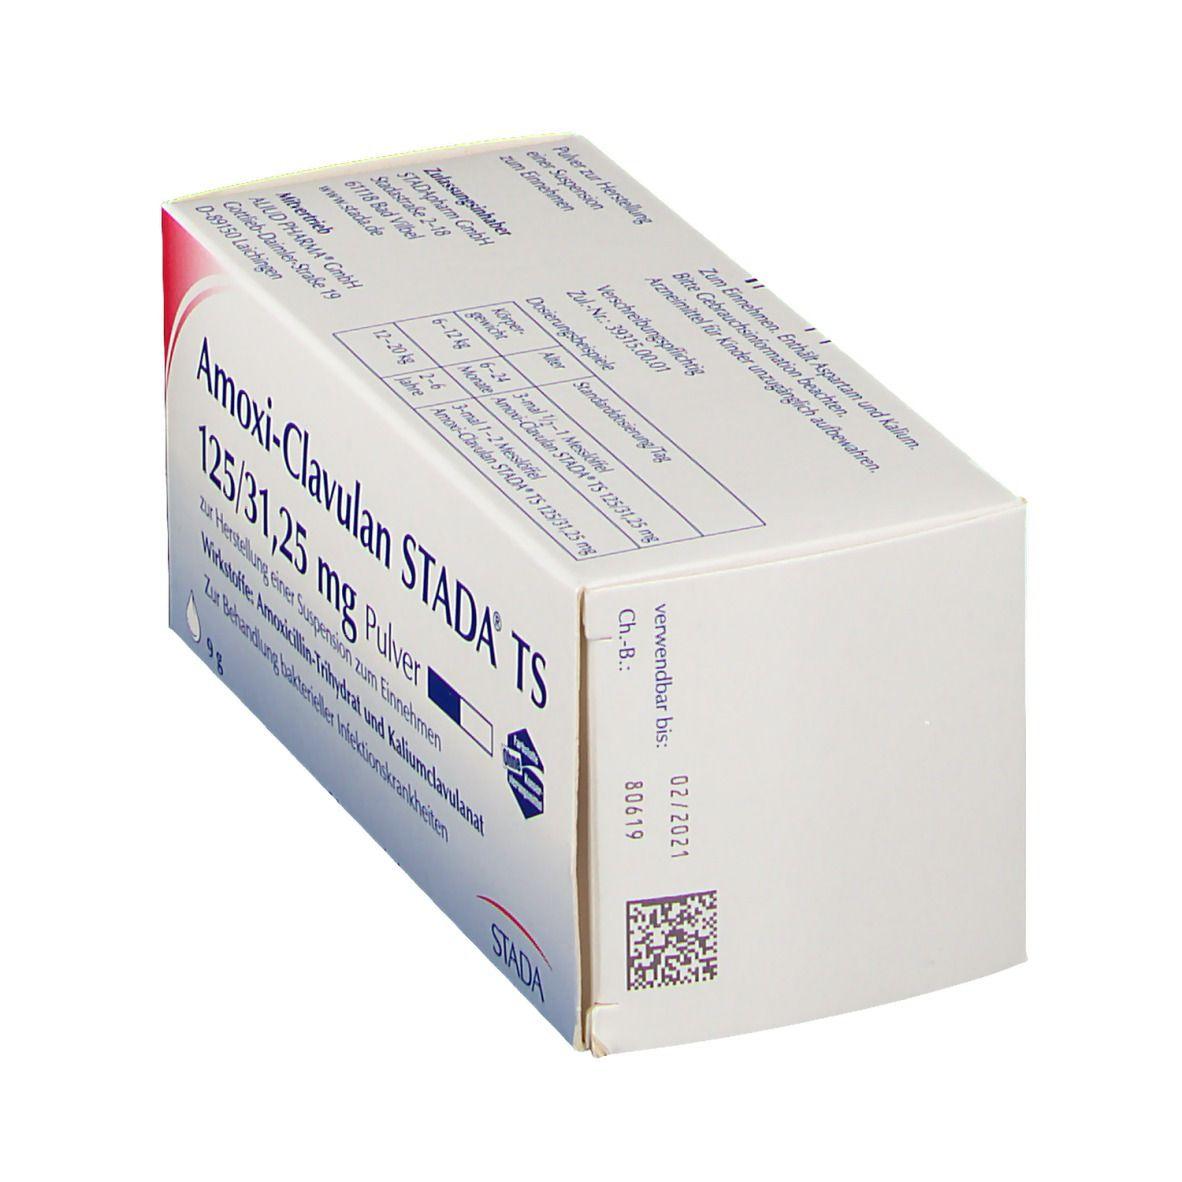 Amoxi Clavulan Stada® TS 125/31,25